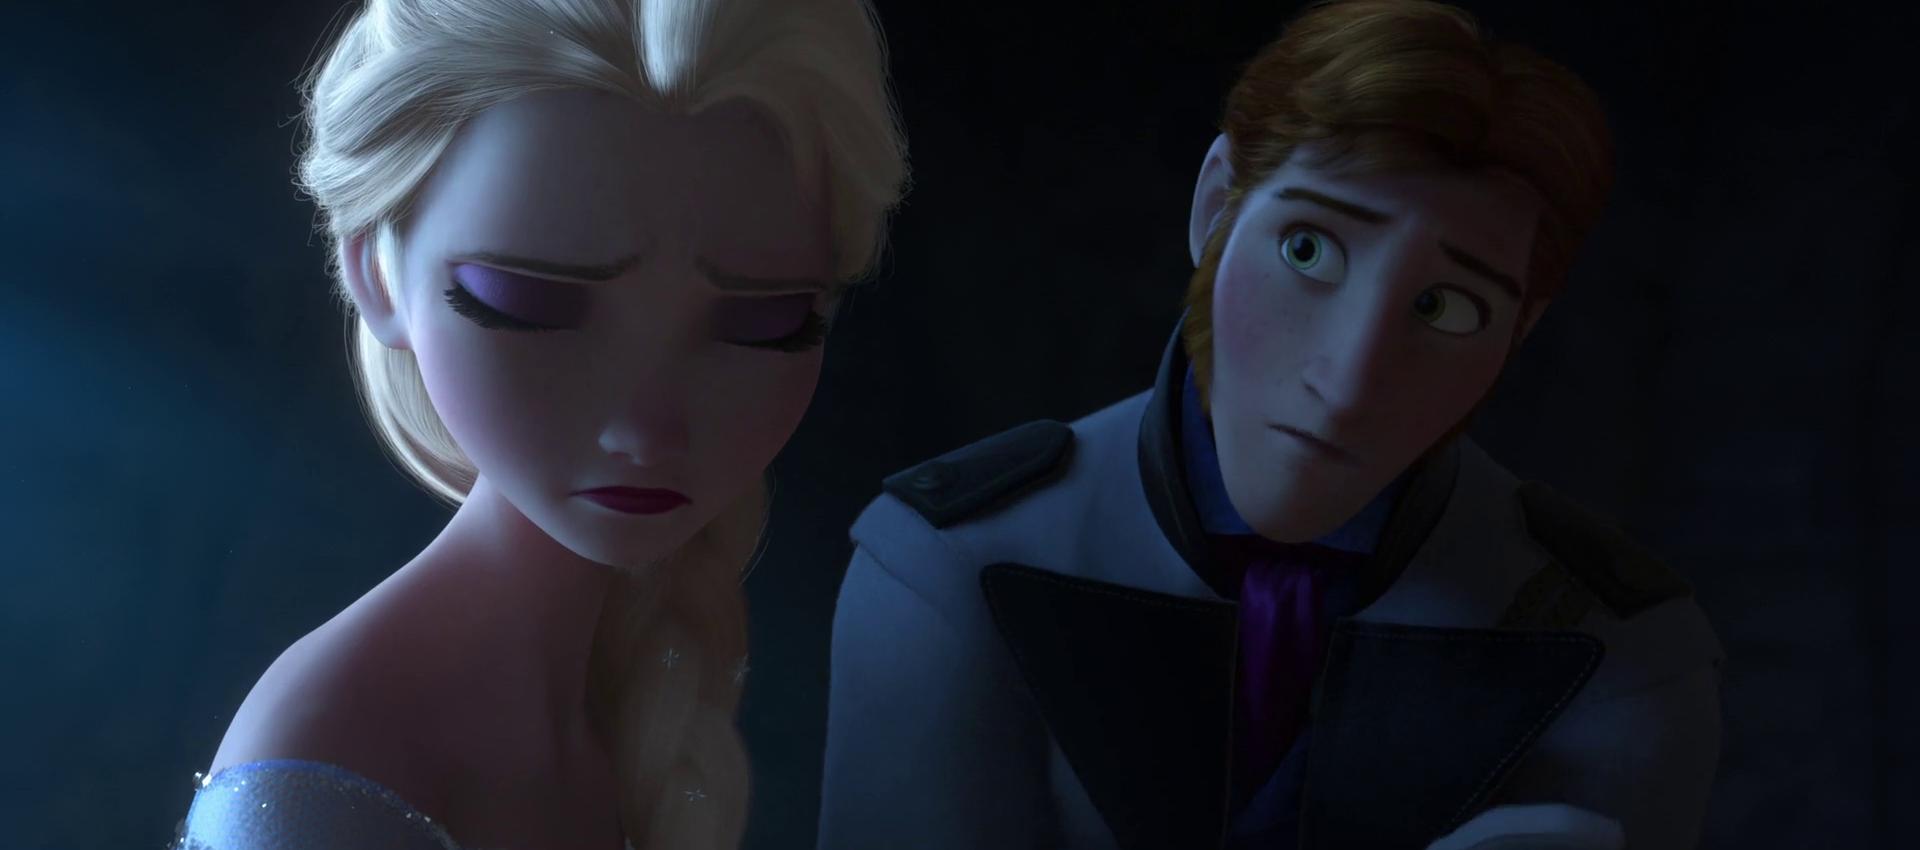 File:Elsa and hans.PNG